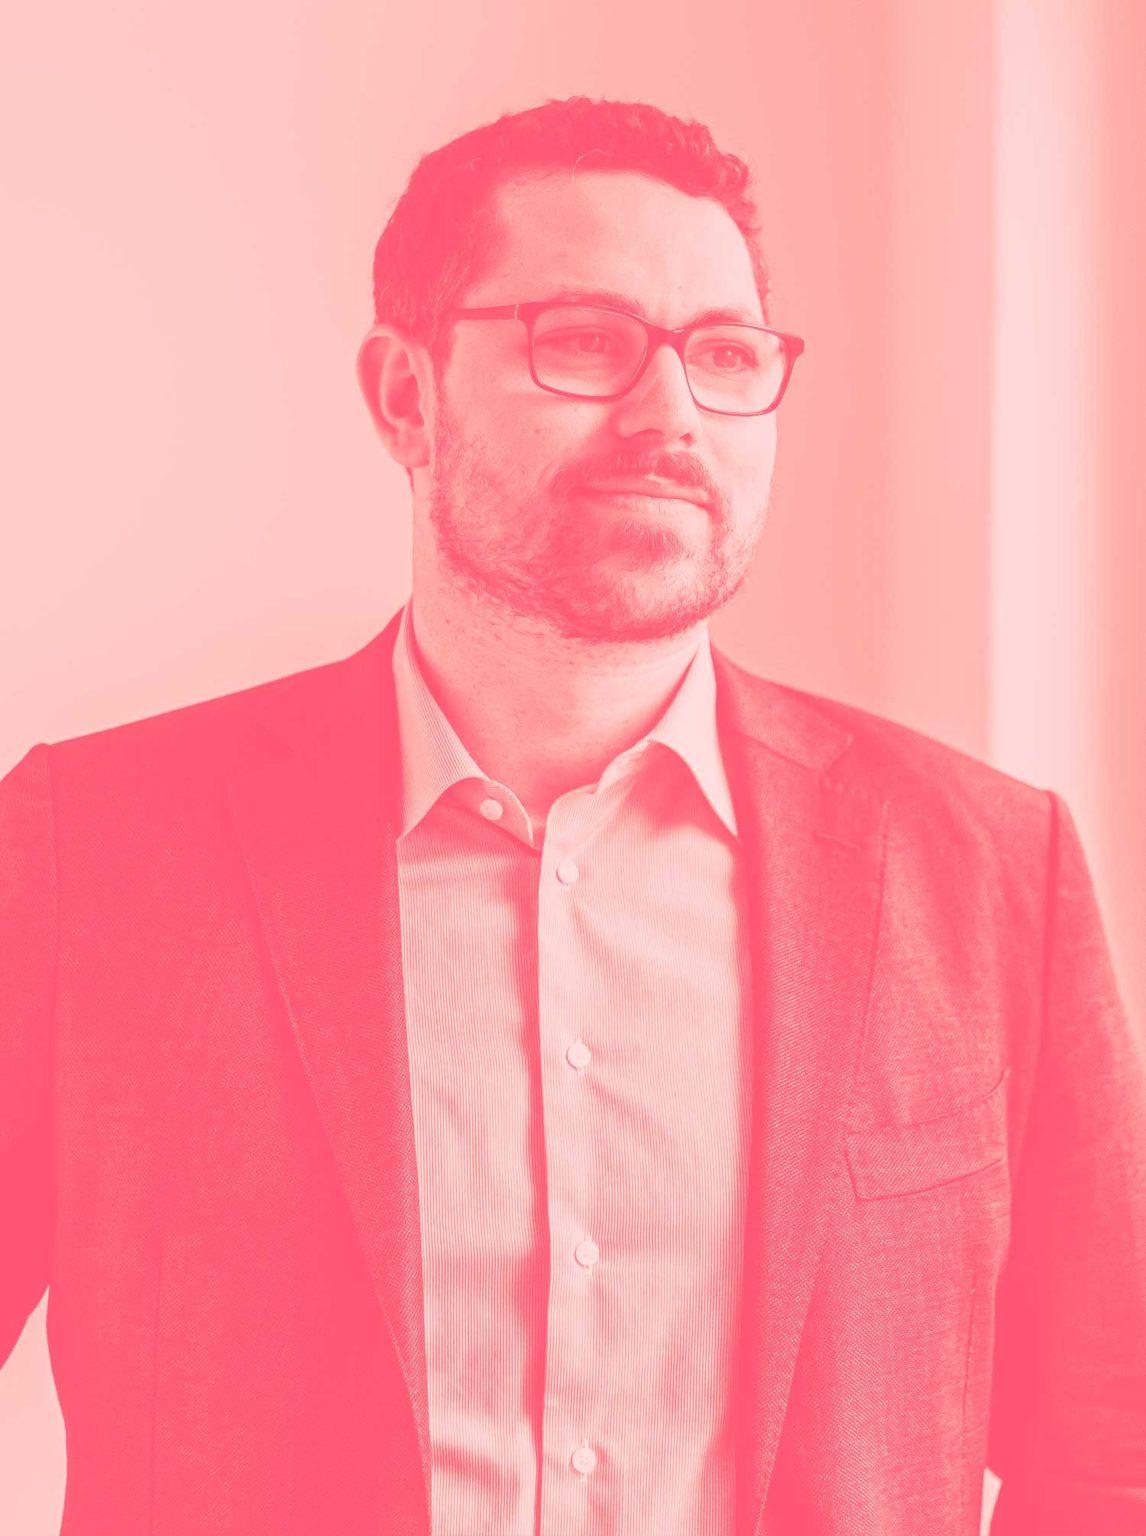 Sebastian - Senior Political Communication Manager